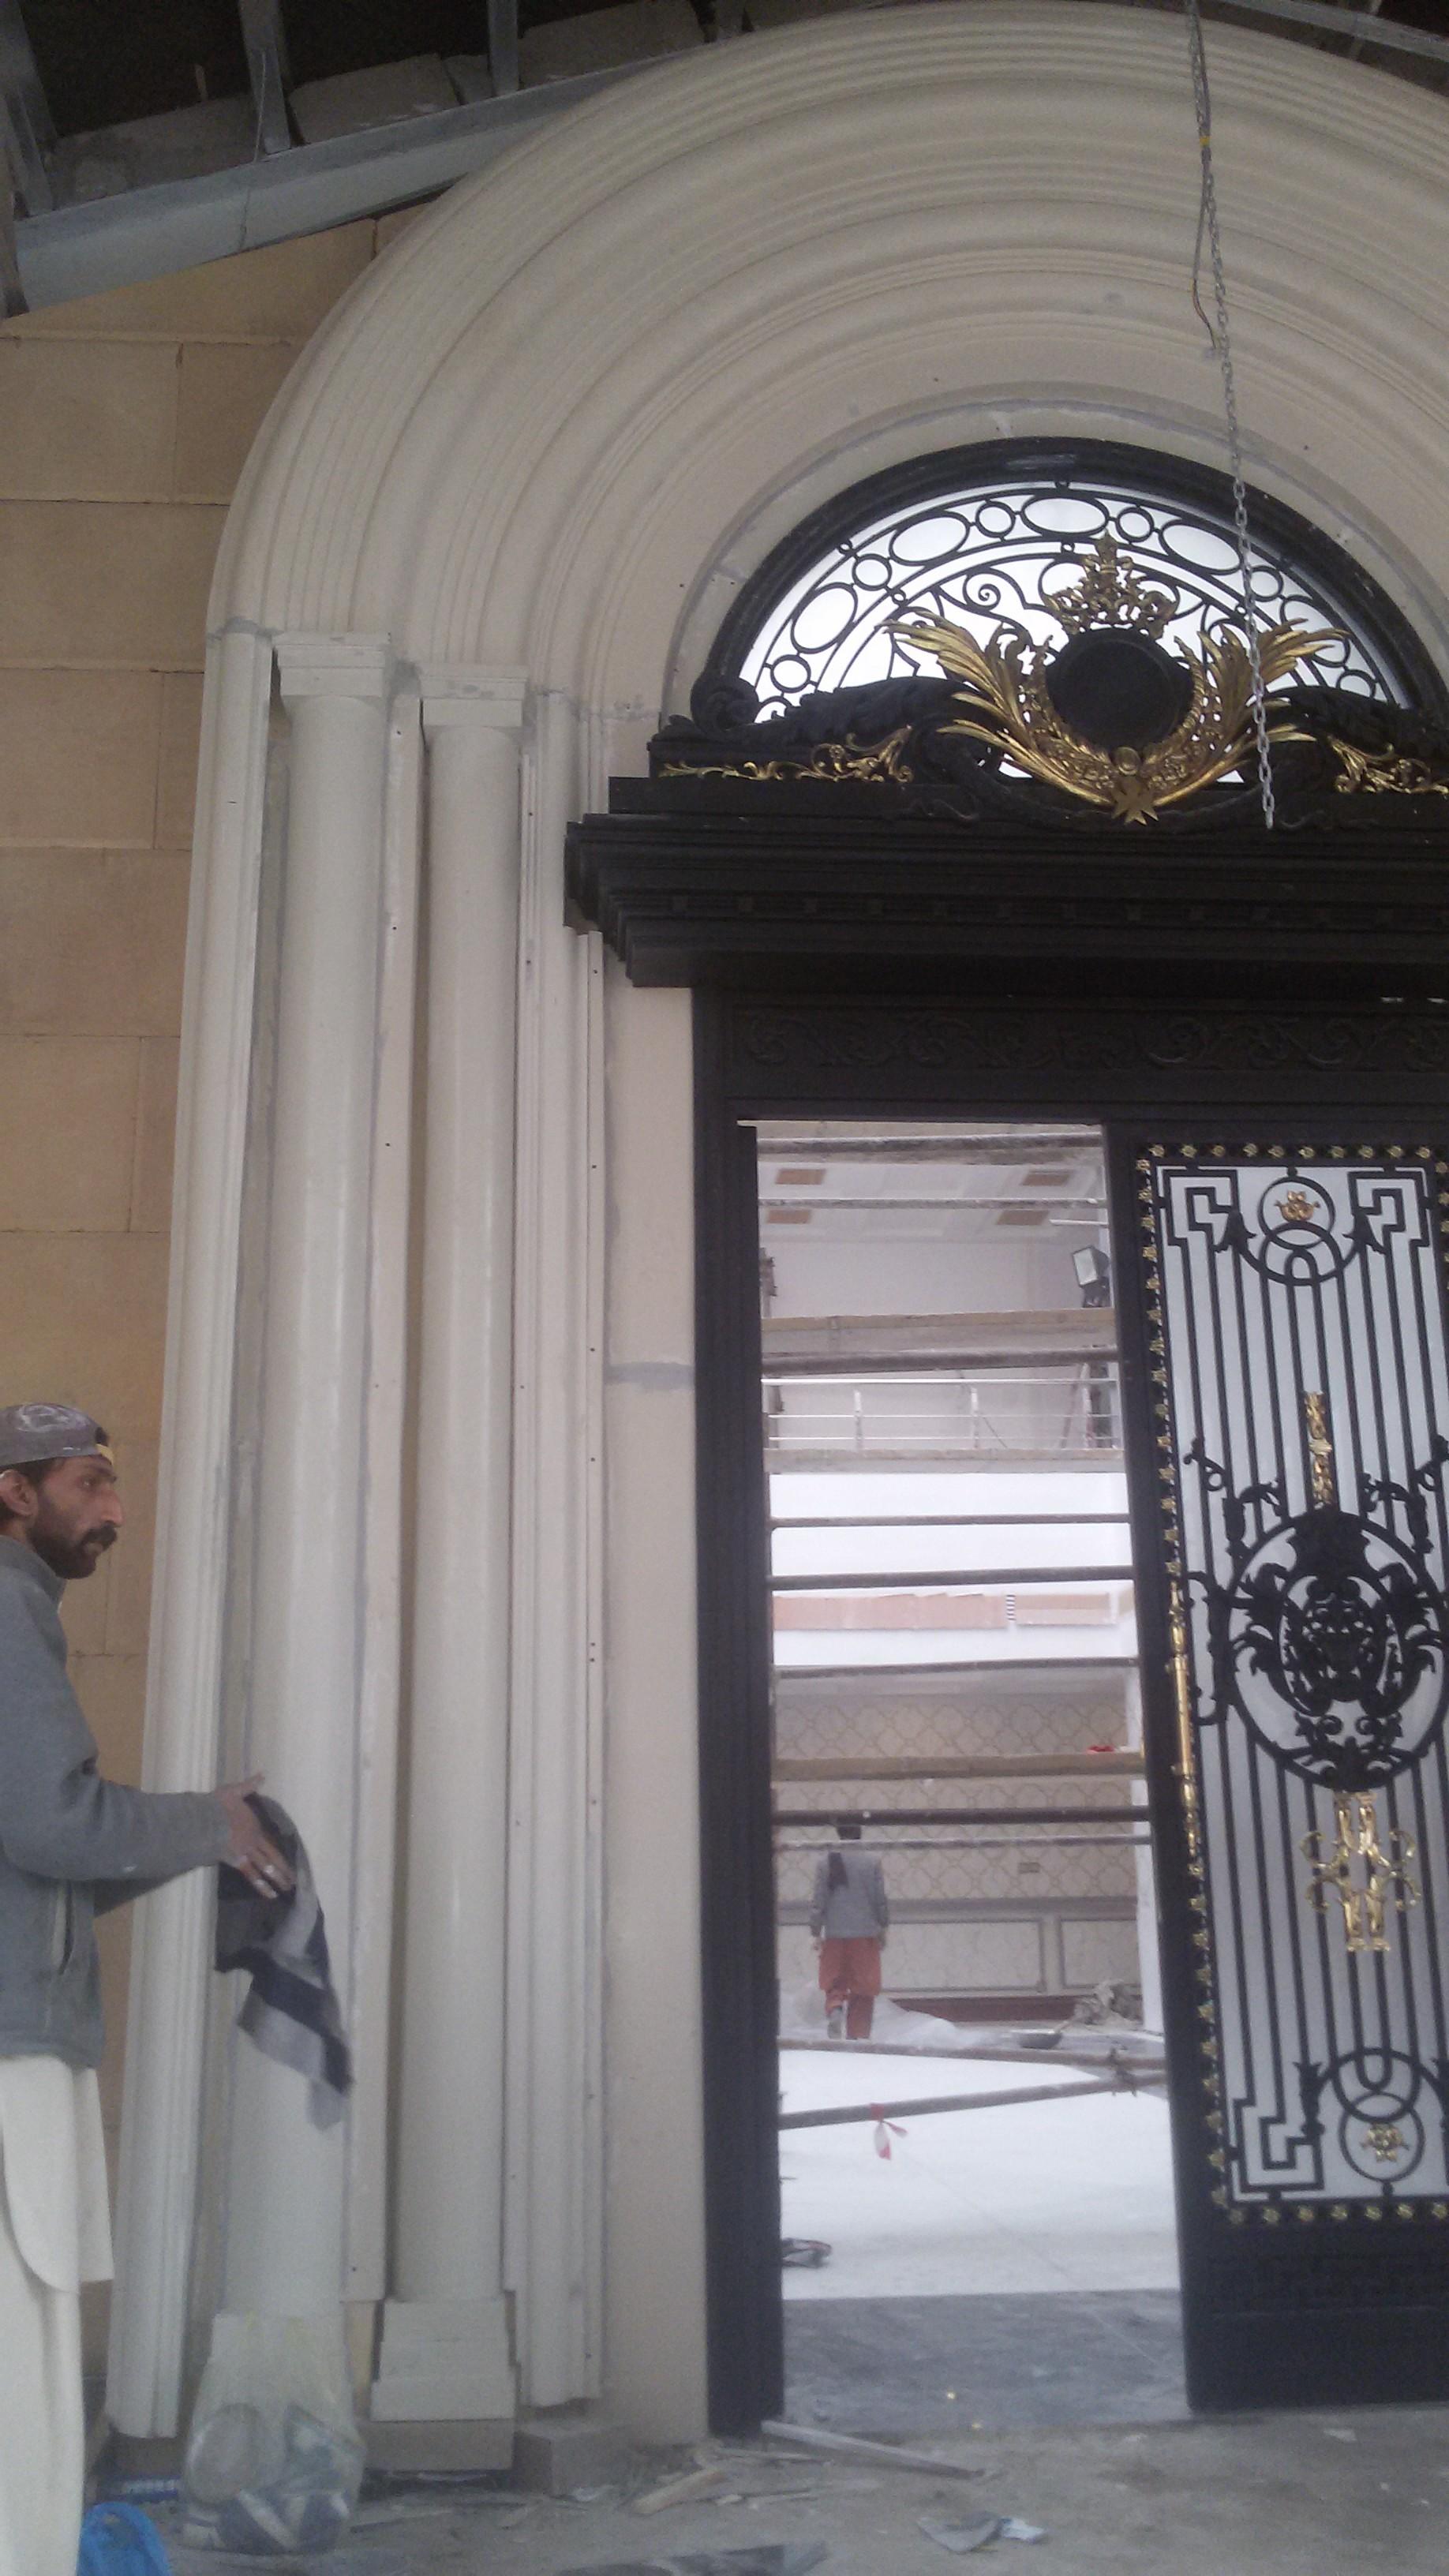 Fiberglass_Arch_pillars_Decorative-pillars_decorative-arch